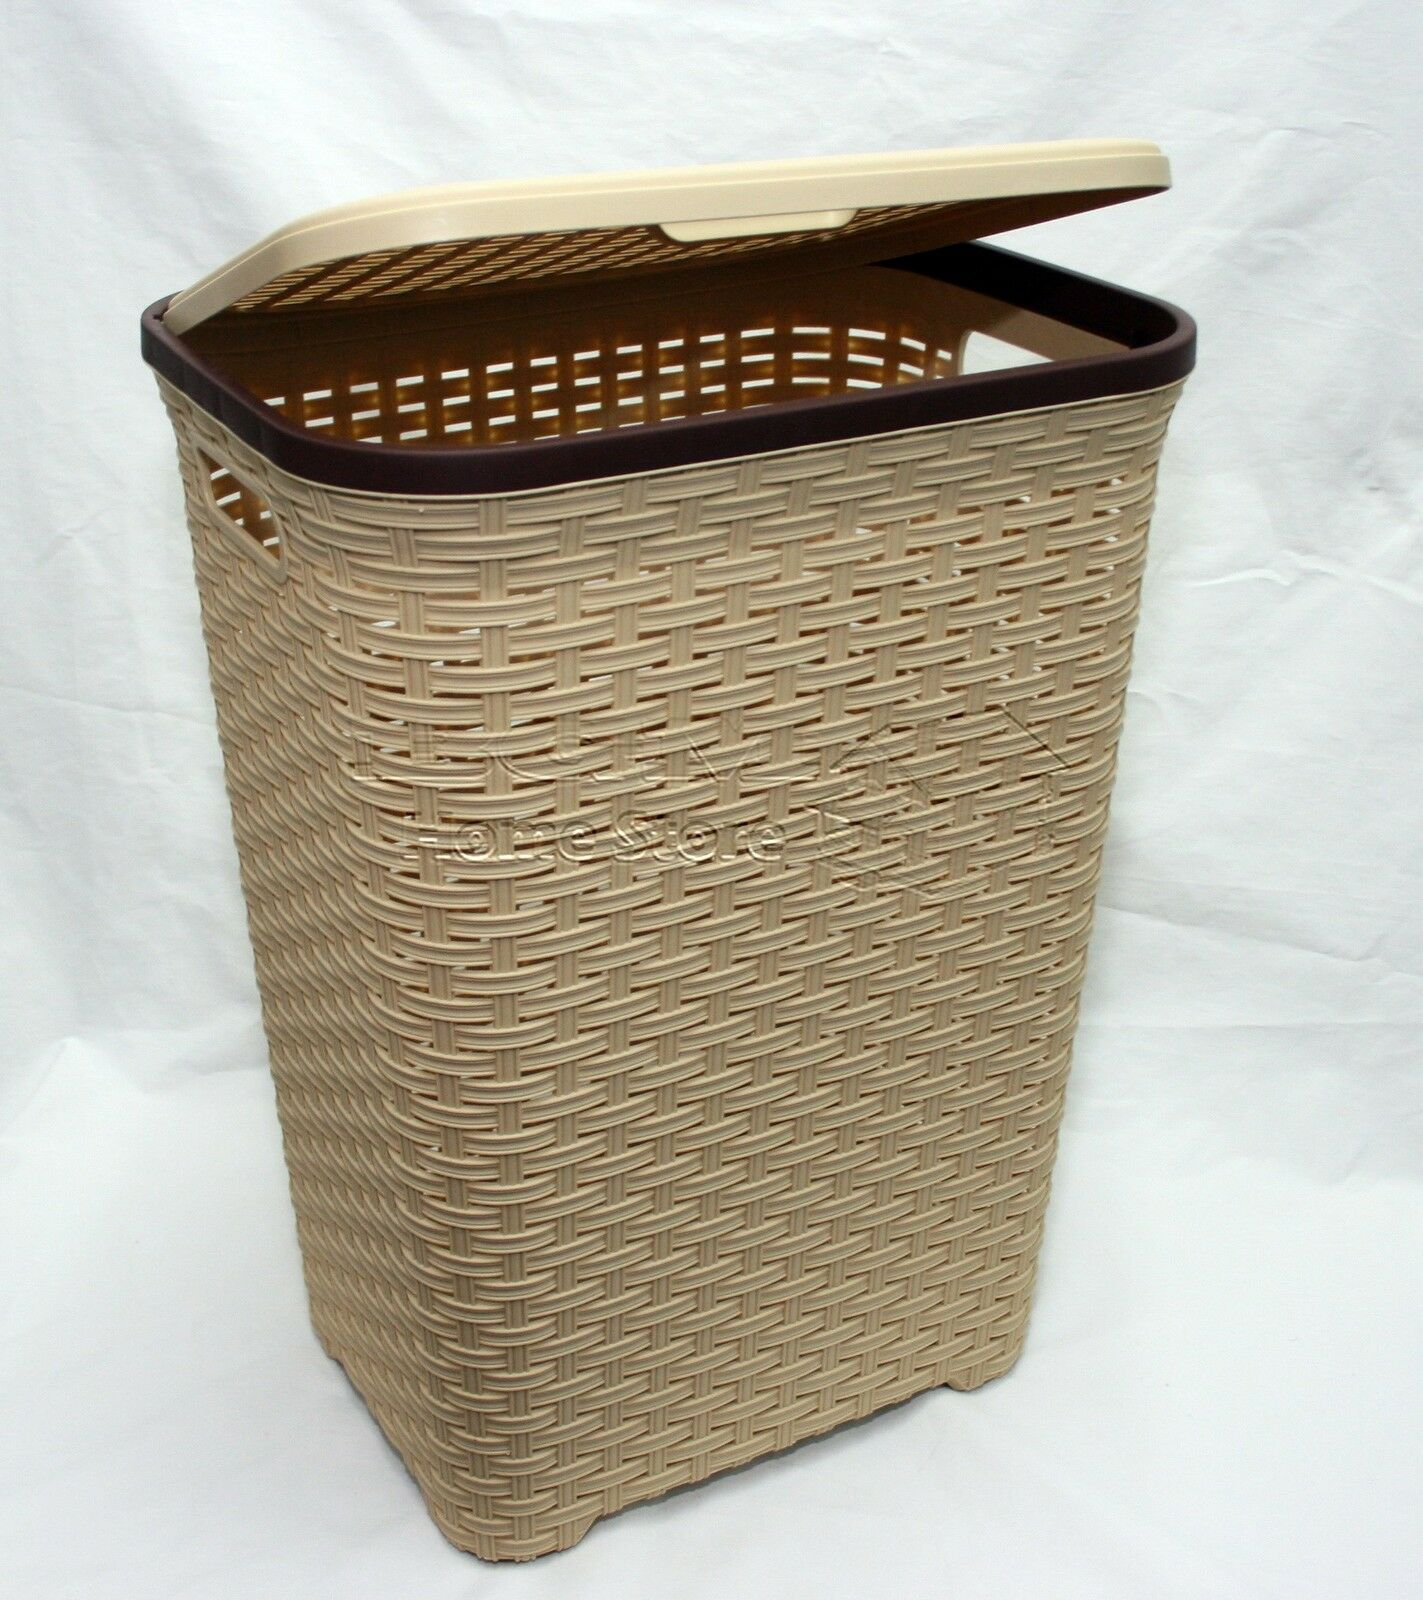 Light Brown 60l Litre Woven Style Rattan Plastic Laundry